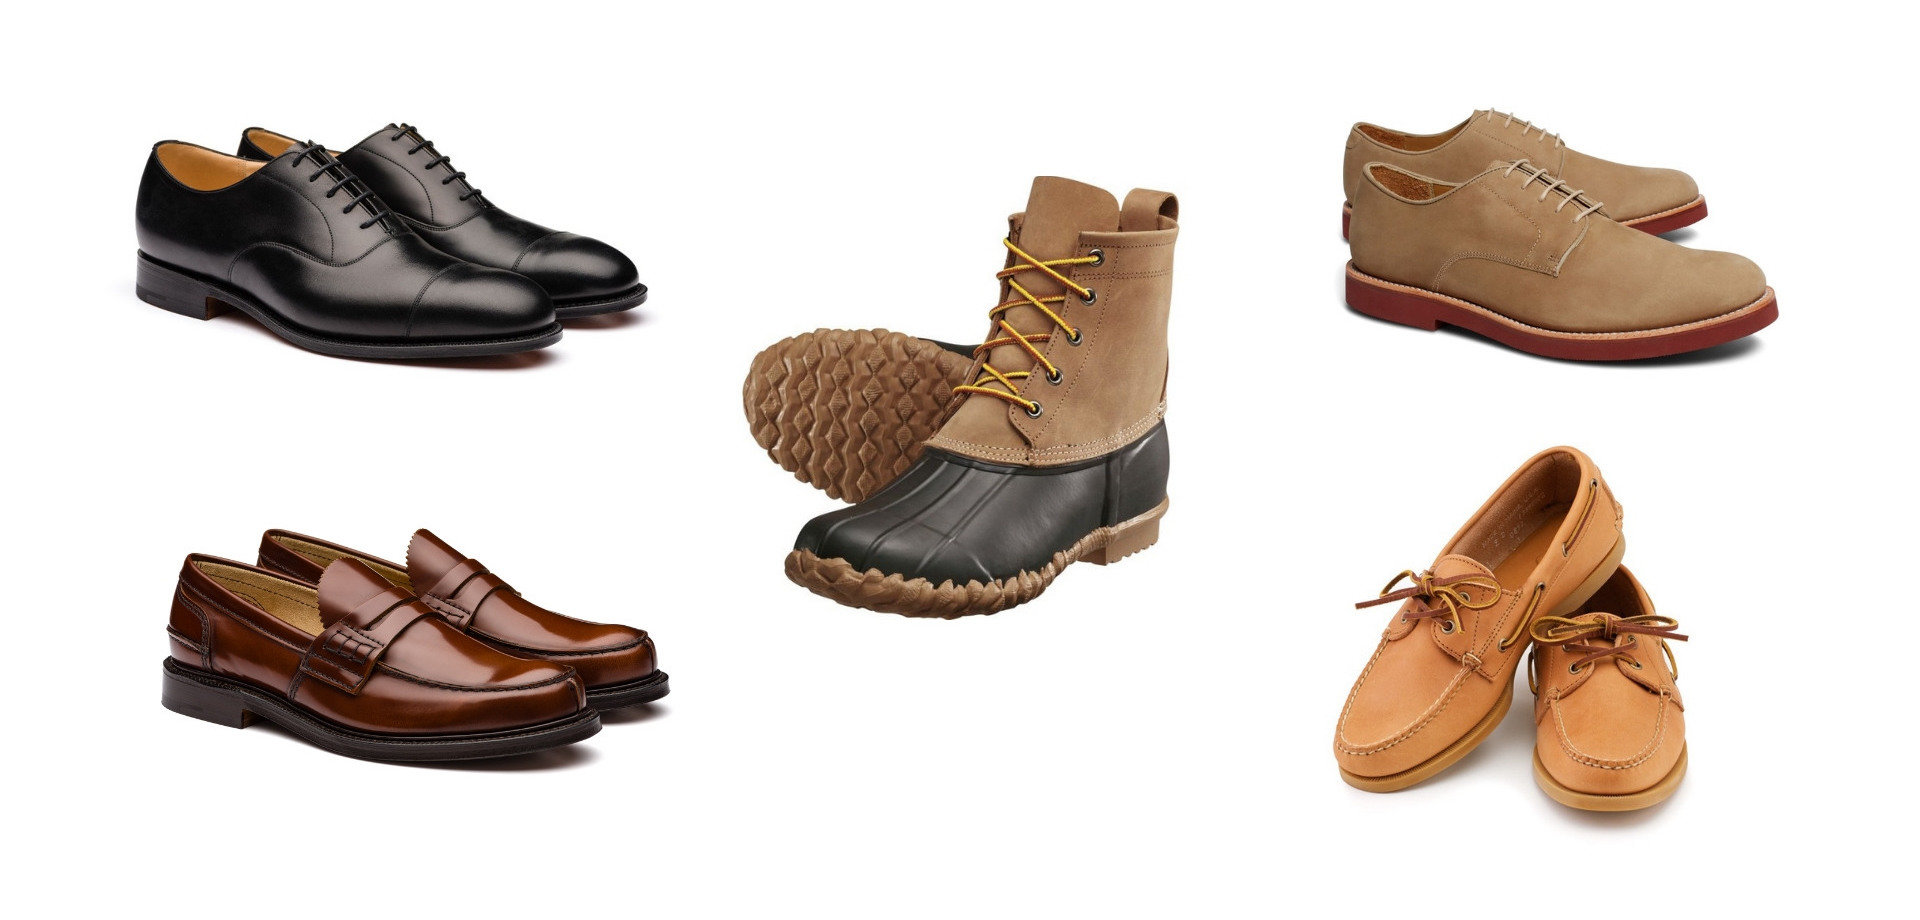 Minimalist shoe collection - preppy